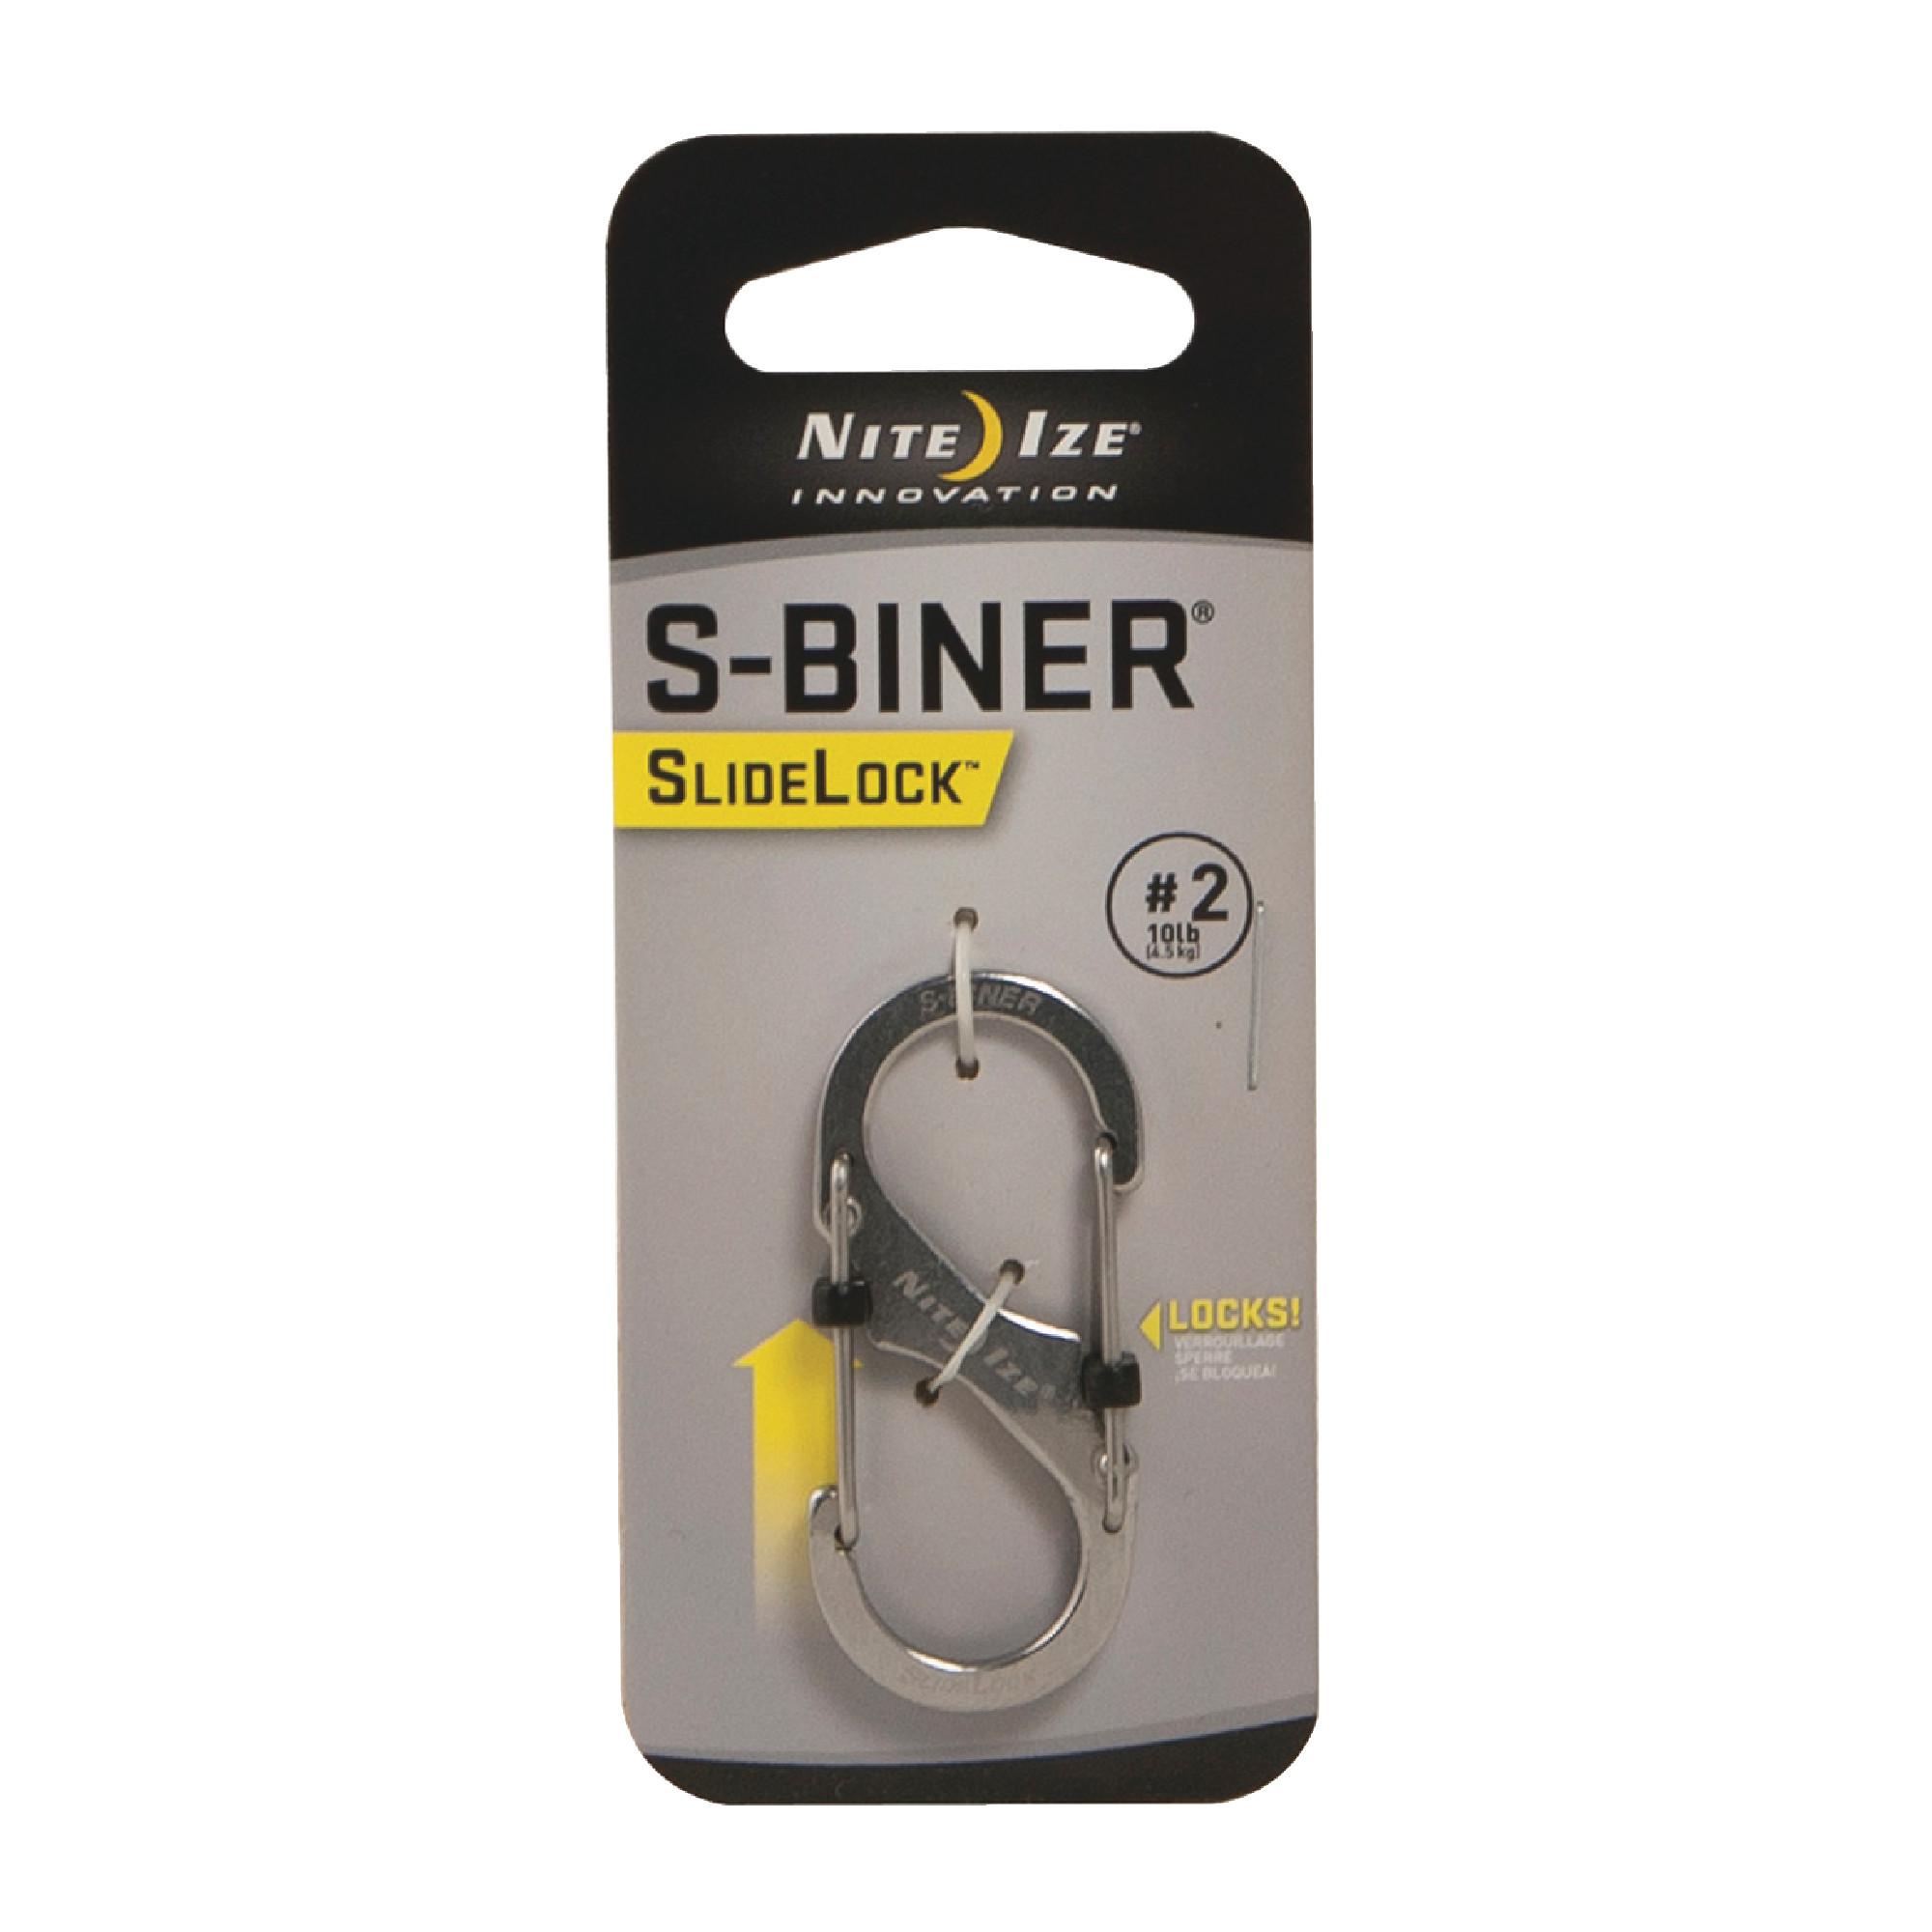 NITE IZE Black #4 75 Lb Rating S-Biner® Locking Double-Gate Carbiner